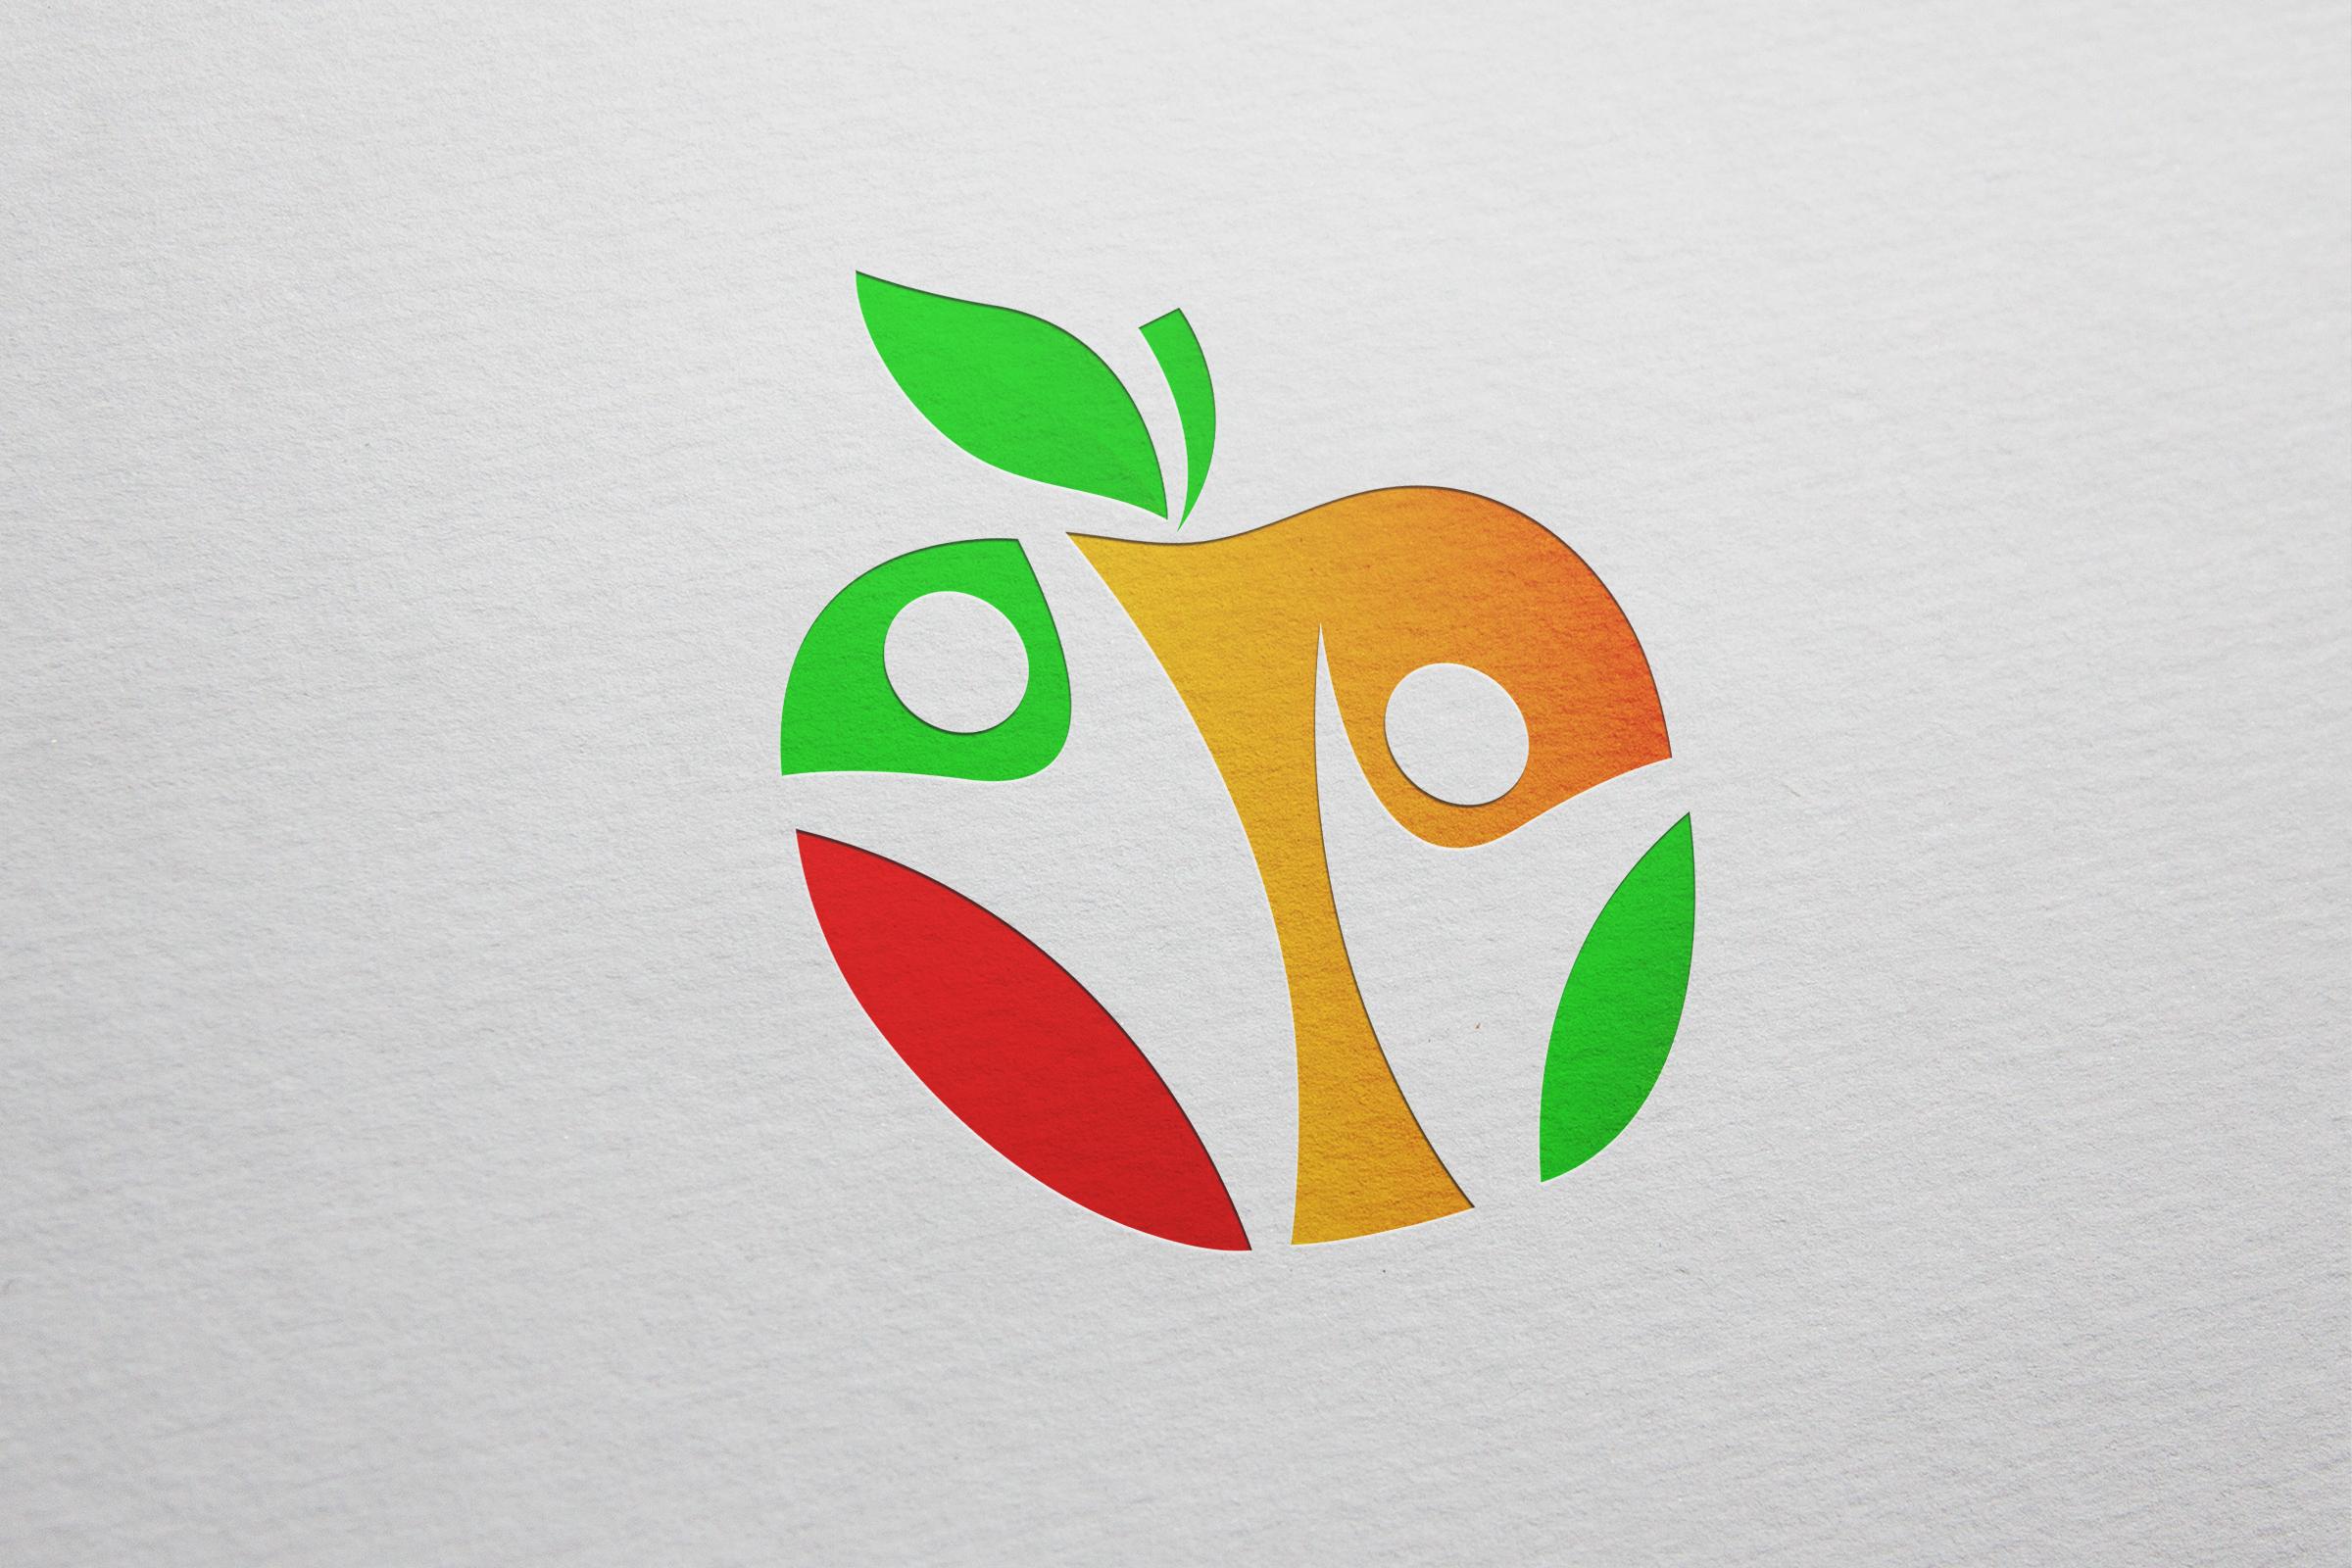 Лого для производства яблочного сока